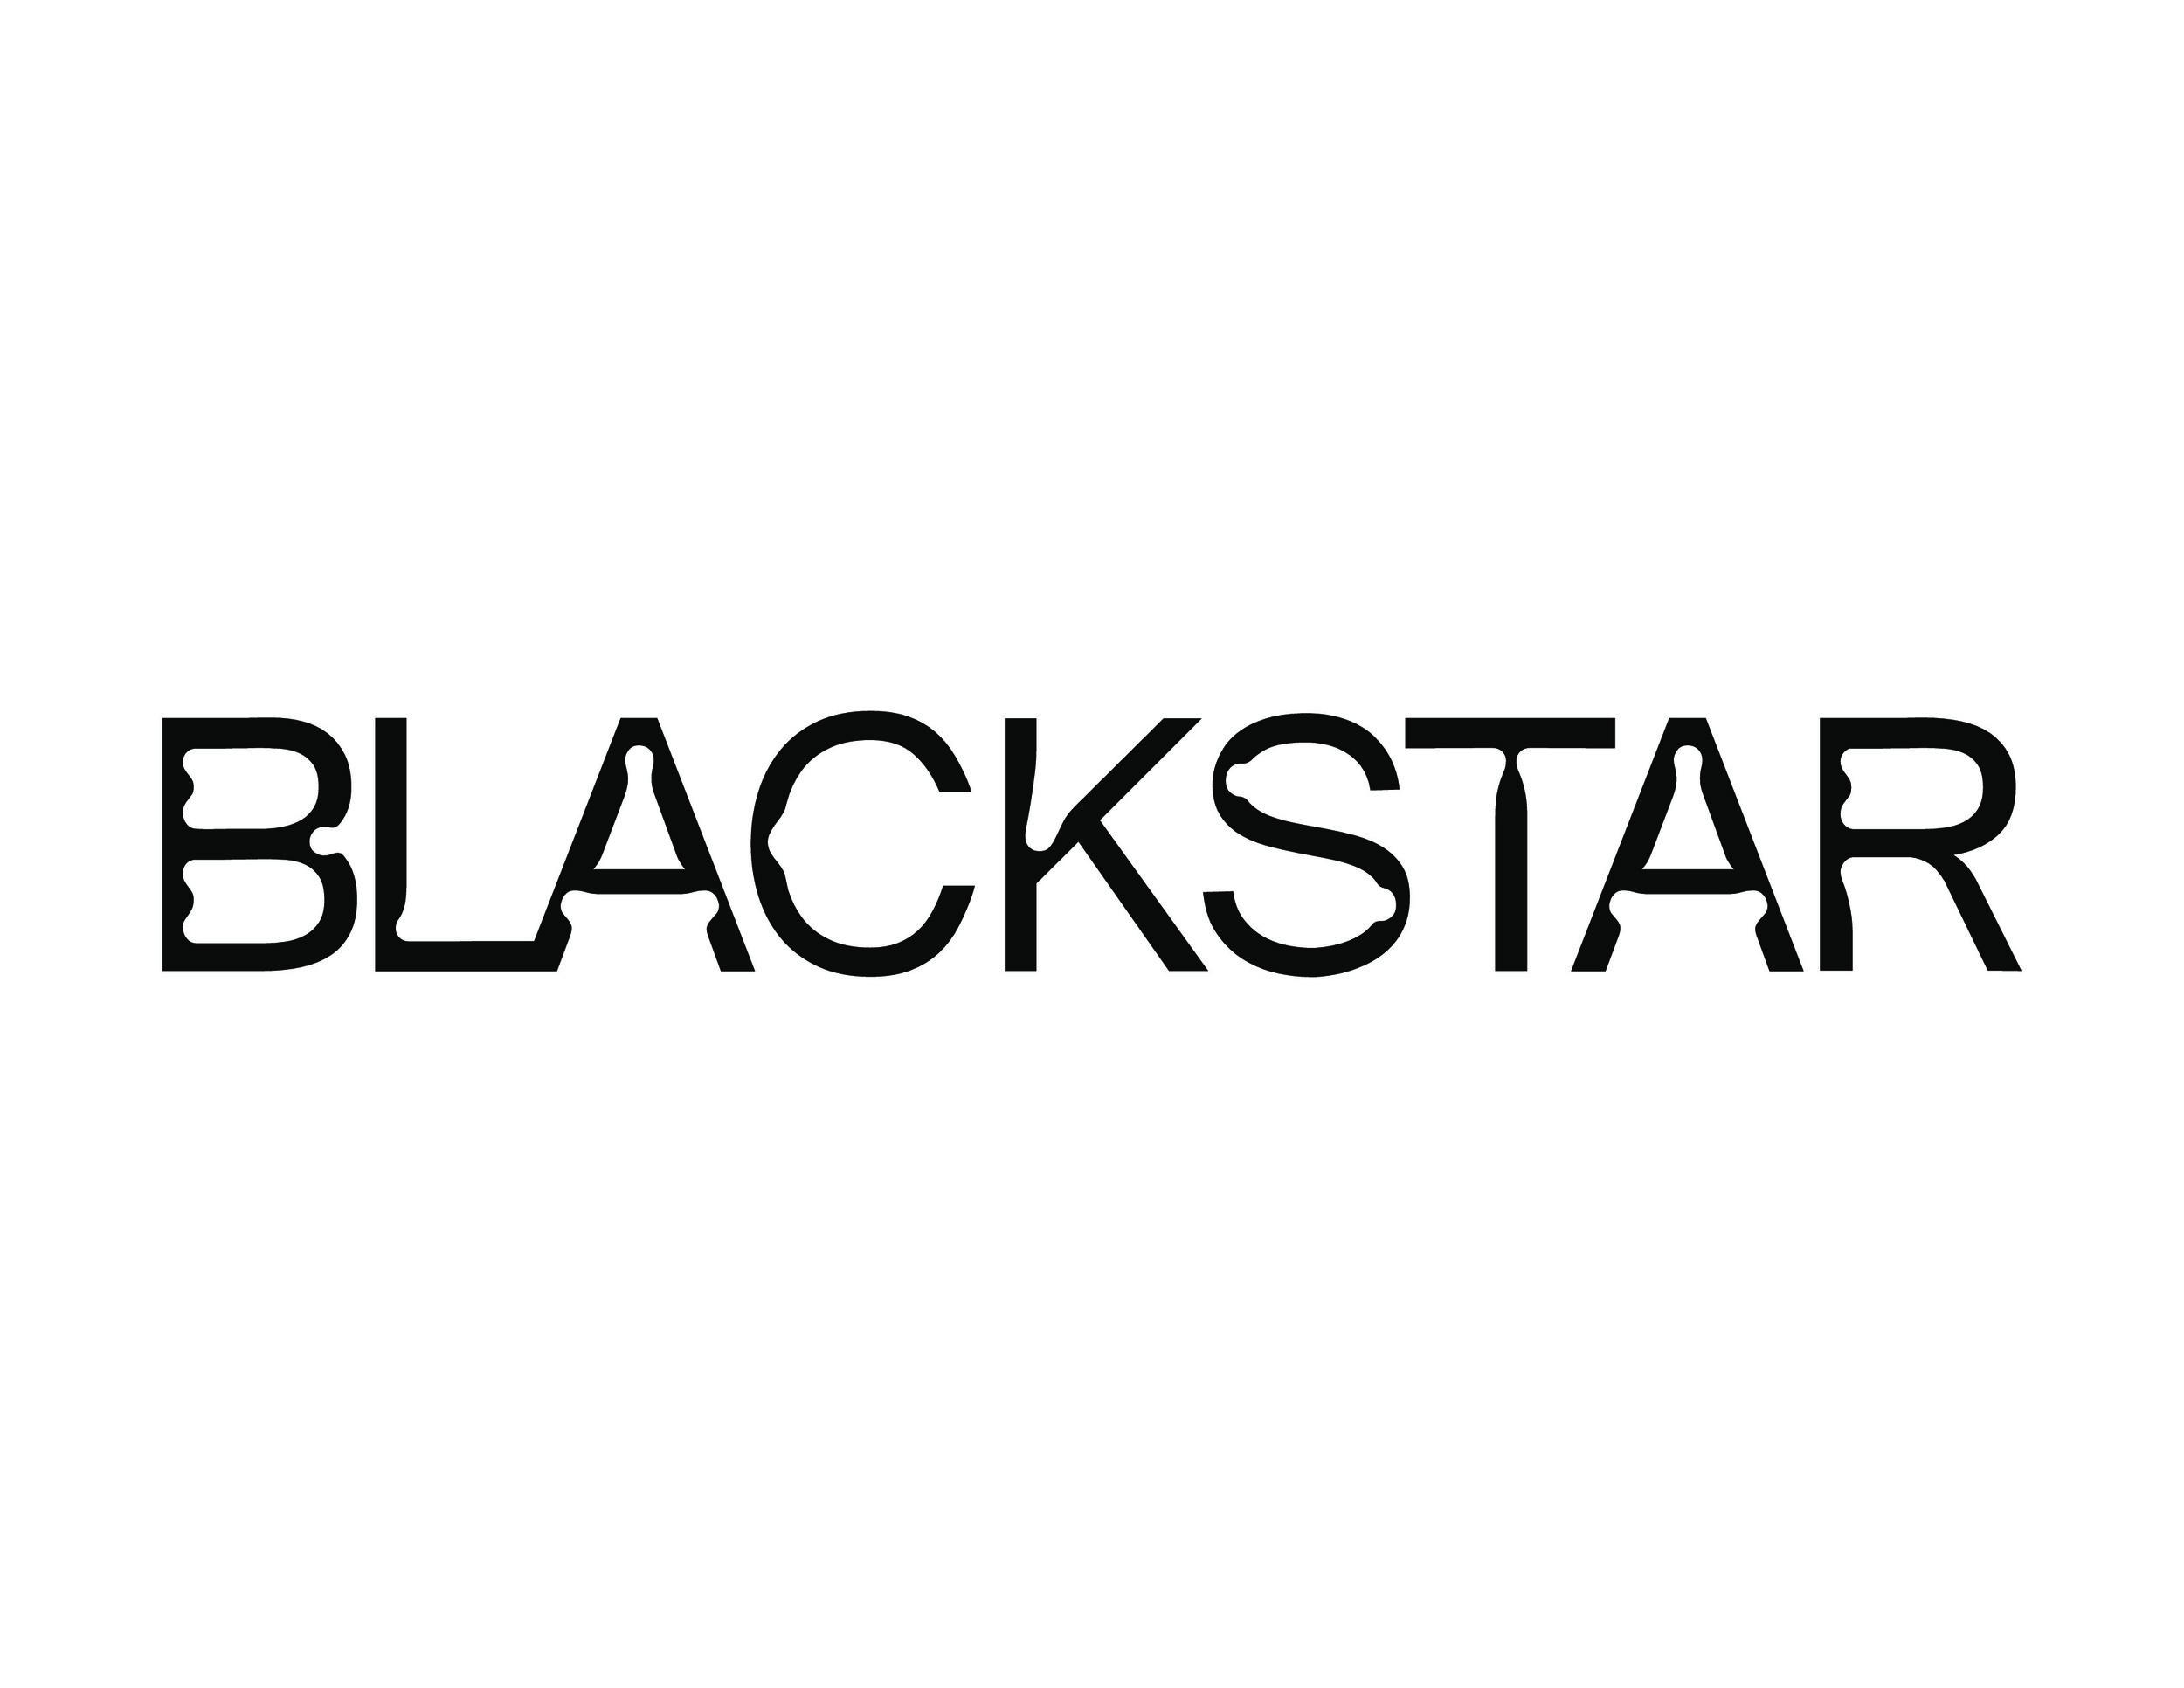 Blackstar_Logos_050719_Wordmark-page-0.jpg